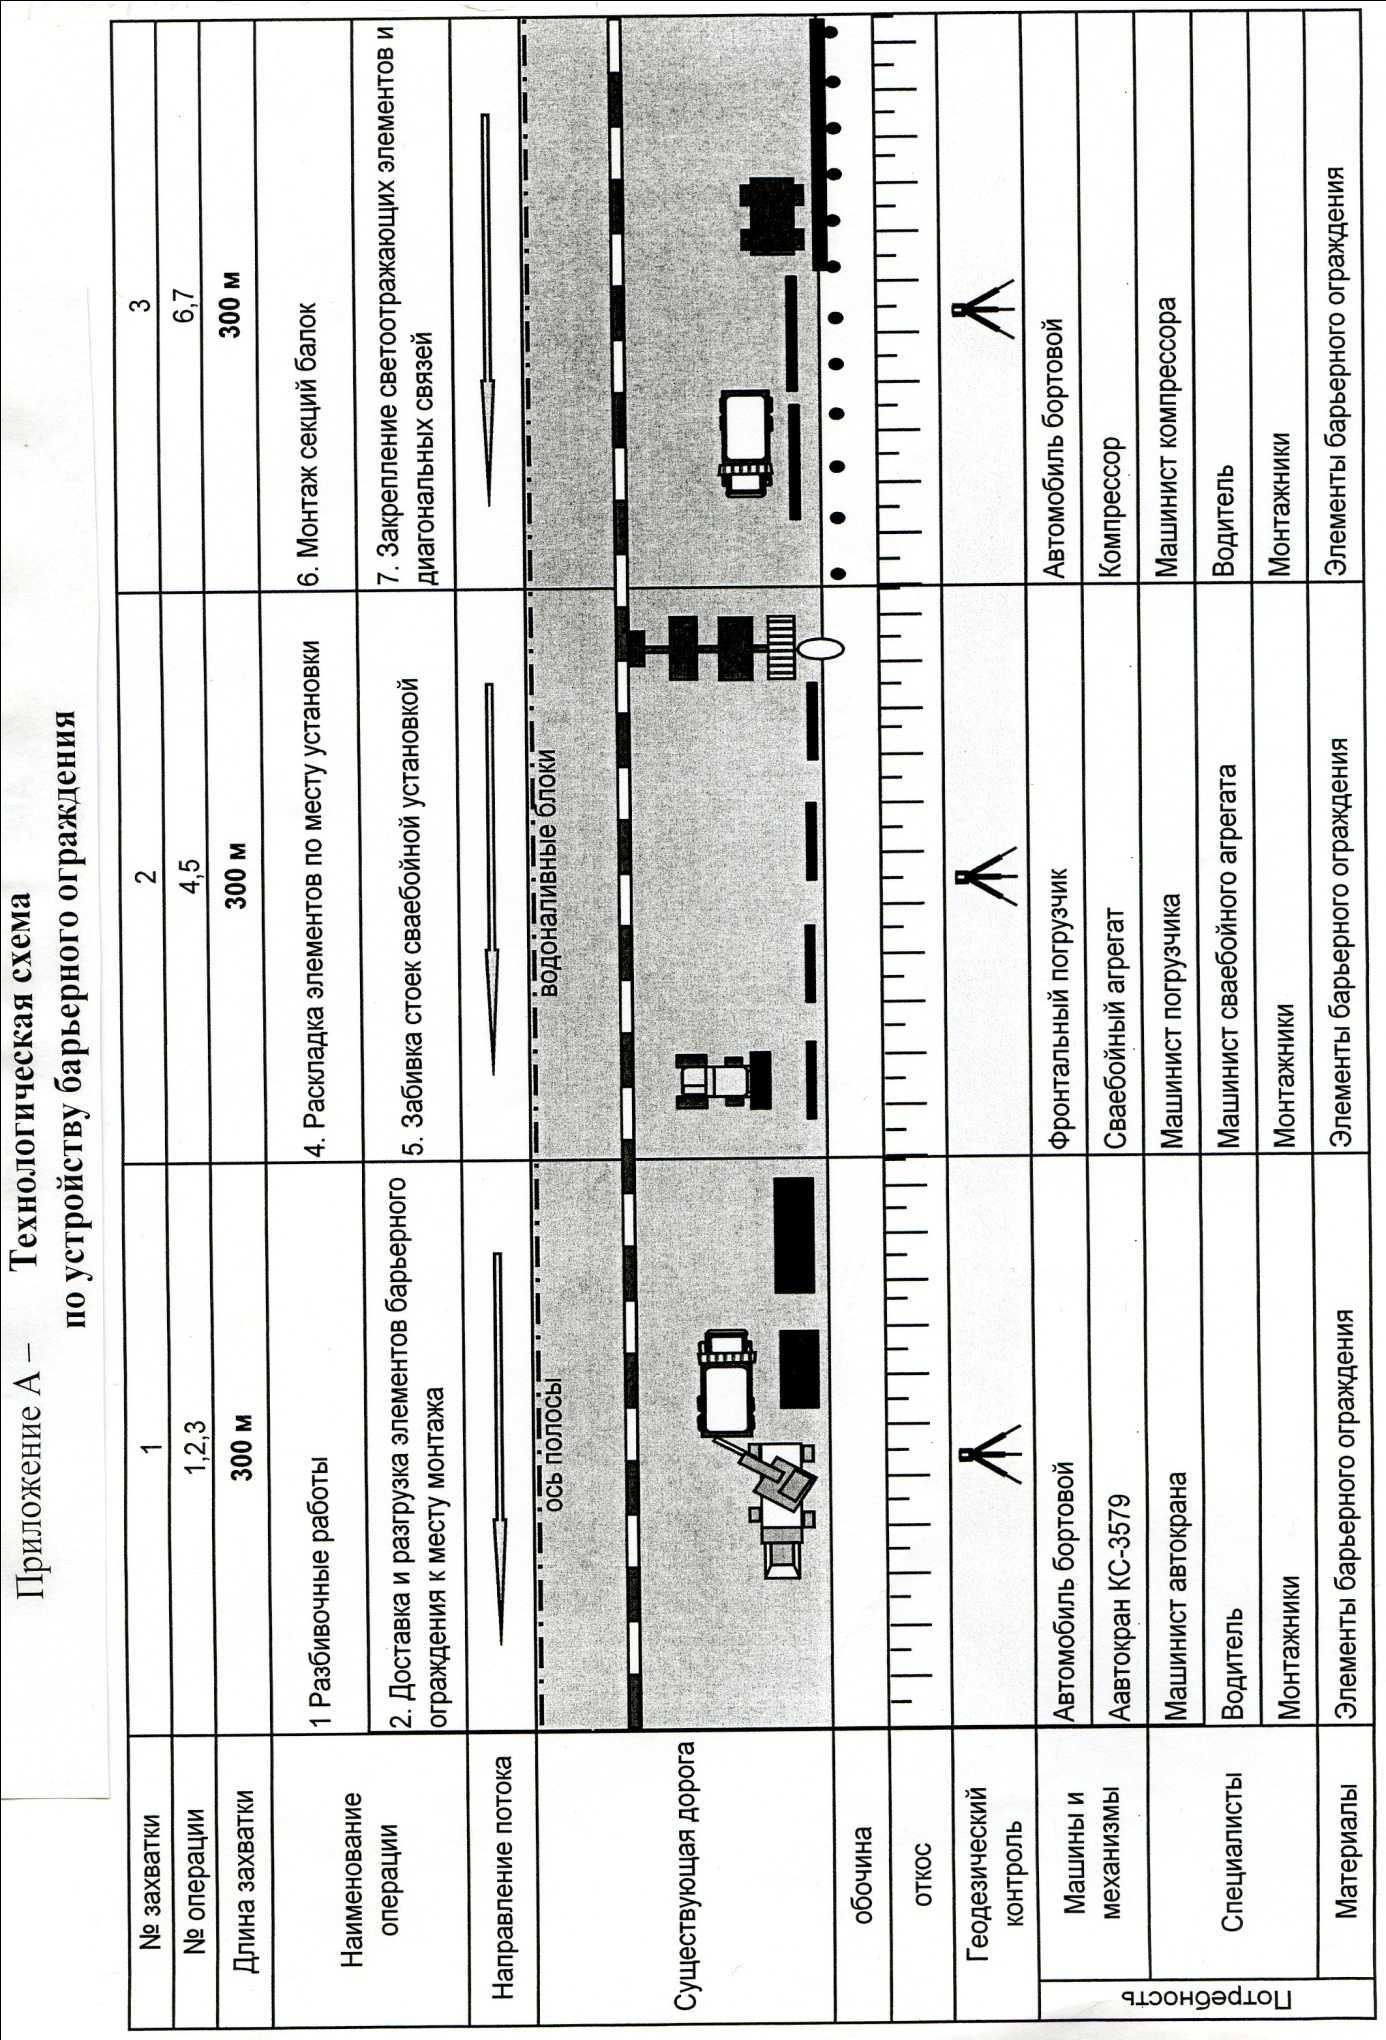 Гост р 52488-2005. средства для стирки. общие технические условия